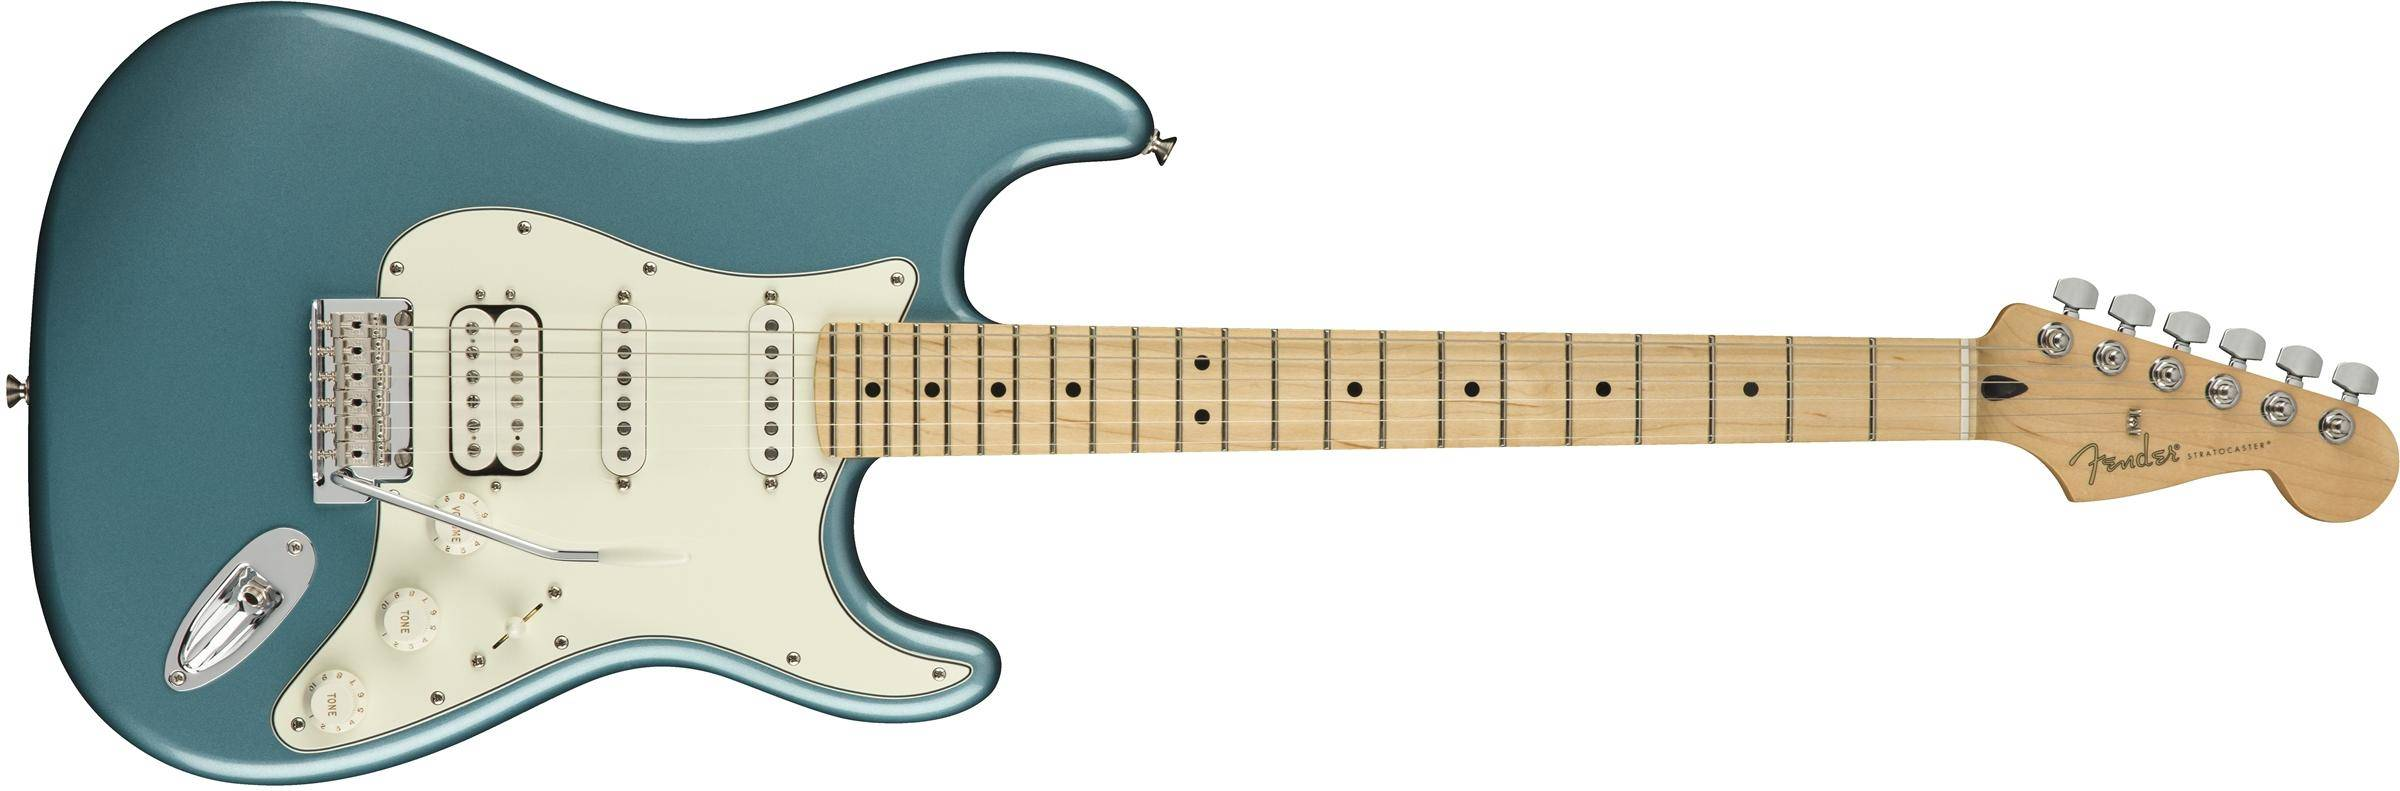 FENDER-Player-Stratocaster-HSS-MN-Tidepool-0144522513-sku-24228